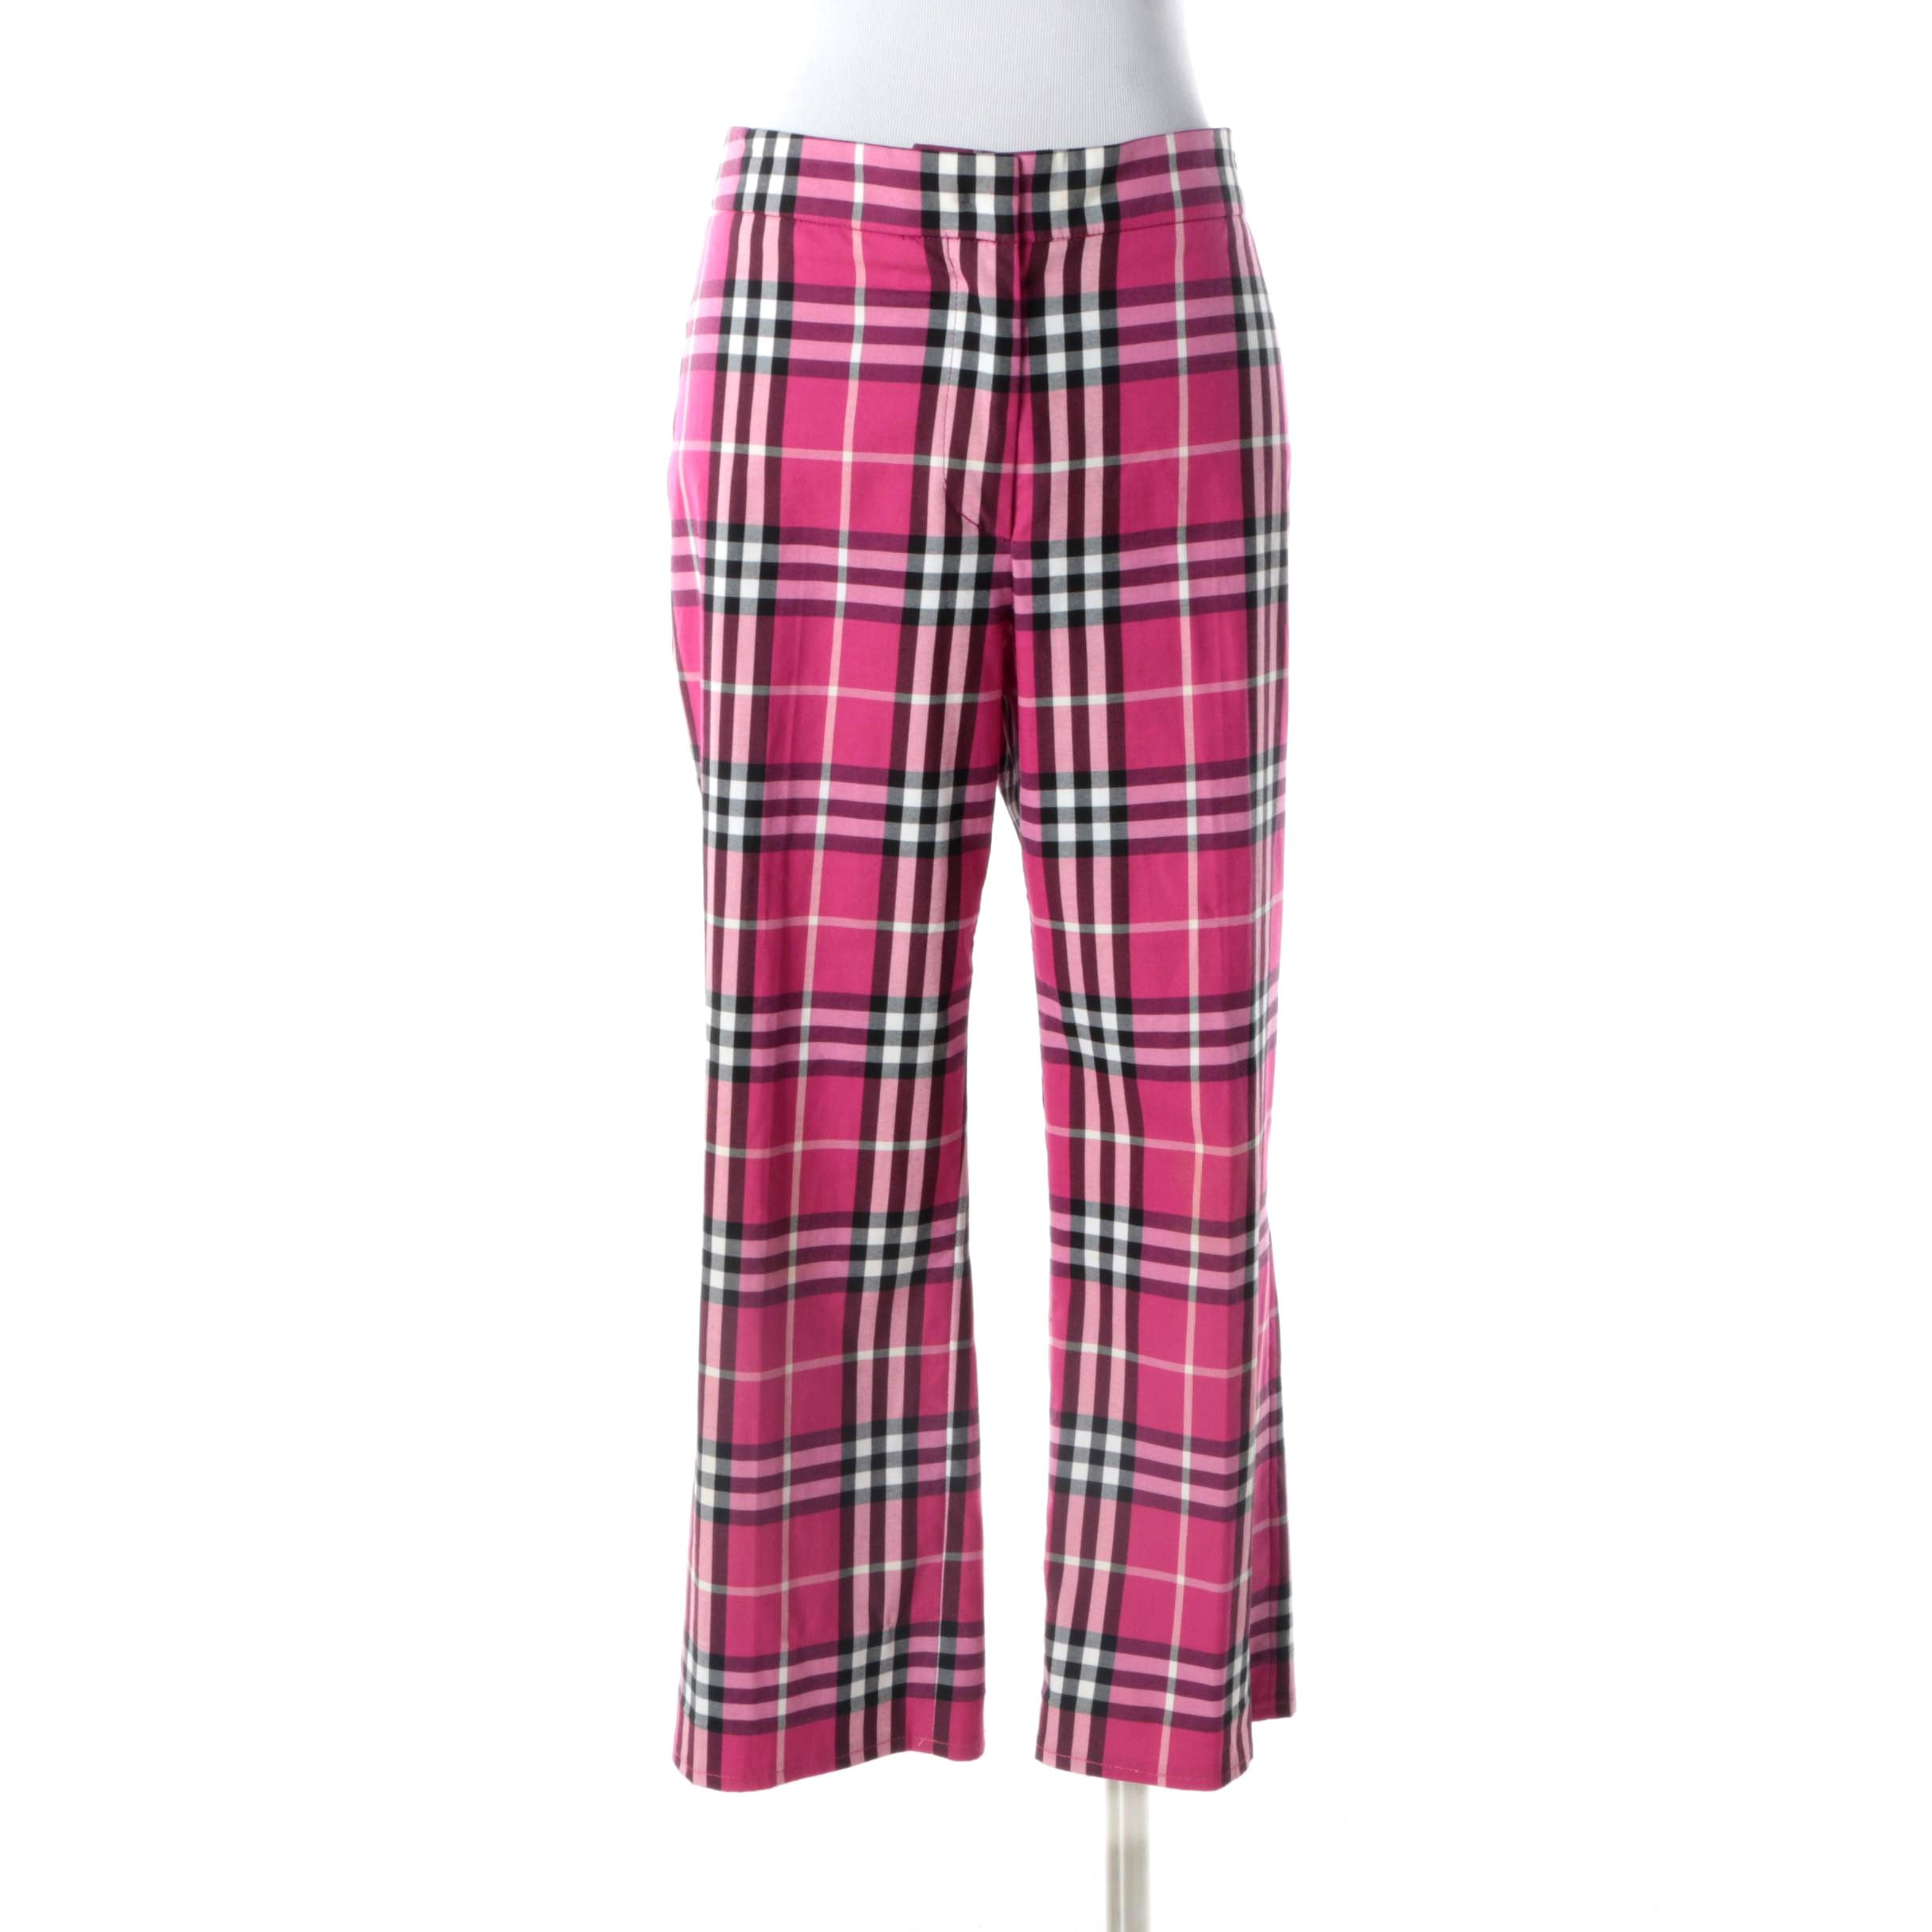 Burberry London Fuchsia Pink Plaid Capri Pants